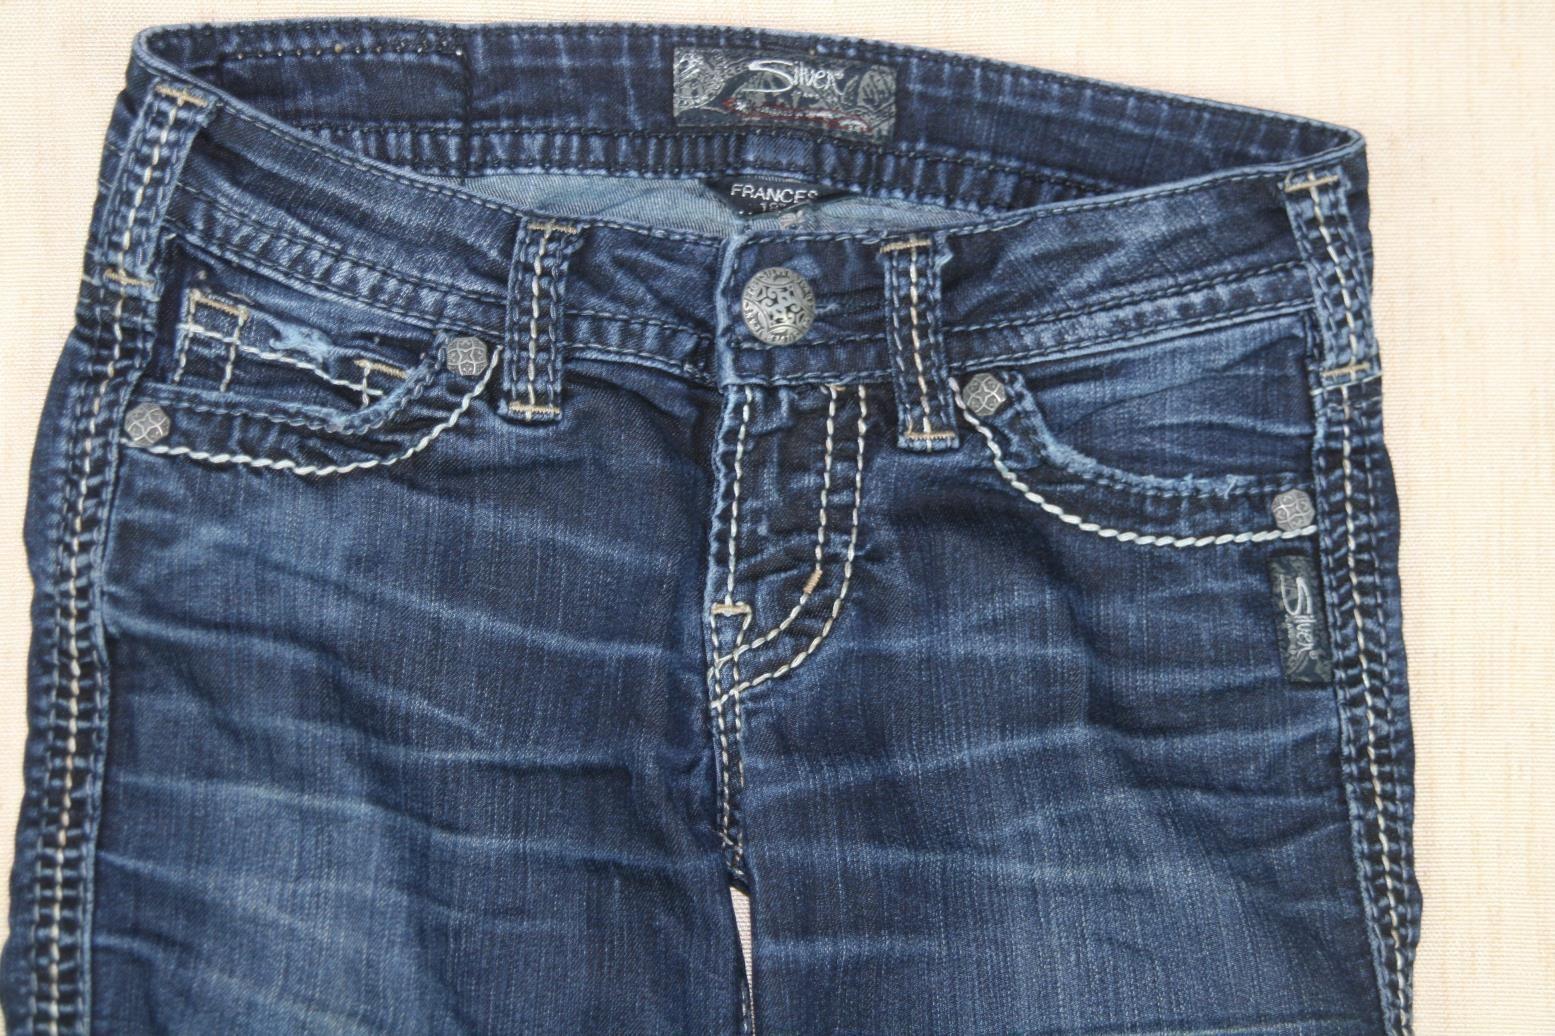 "Silver Jeans Womens Frances ..18""___ Straight Leg Dark Wash Sz 24 X 31"